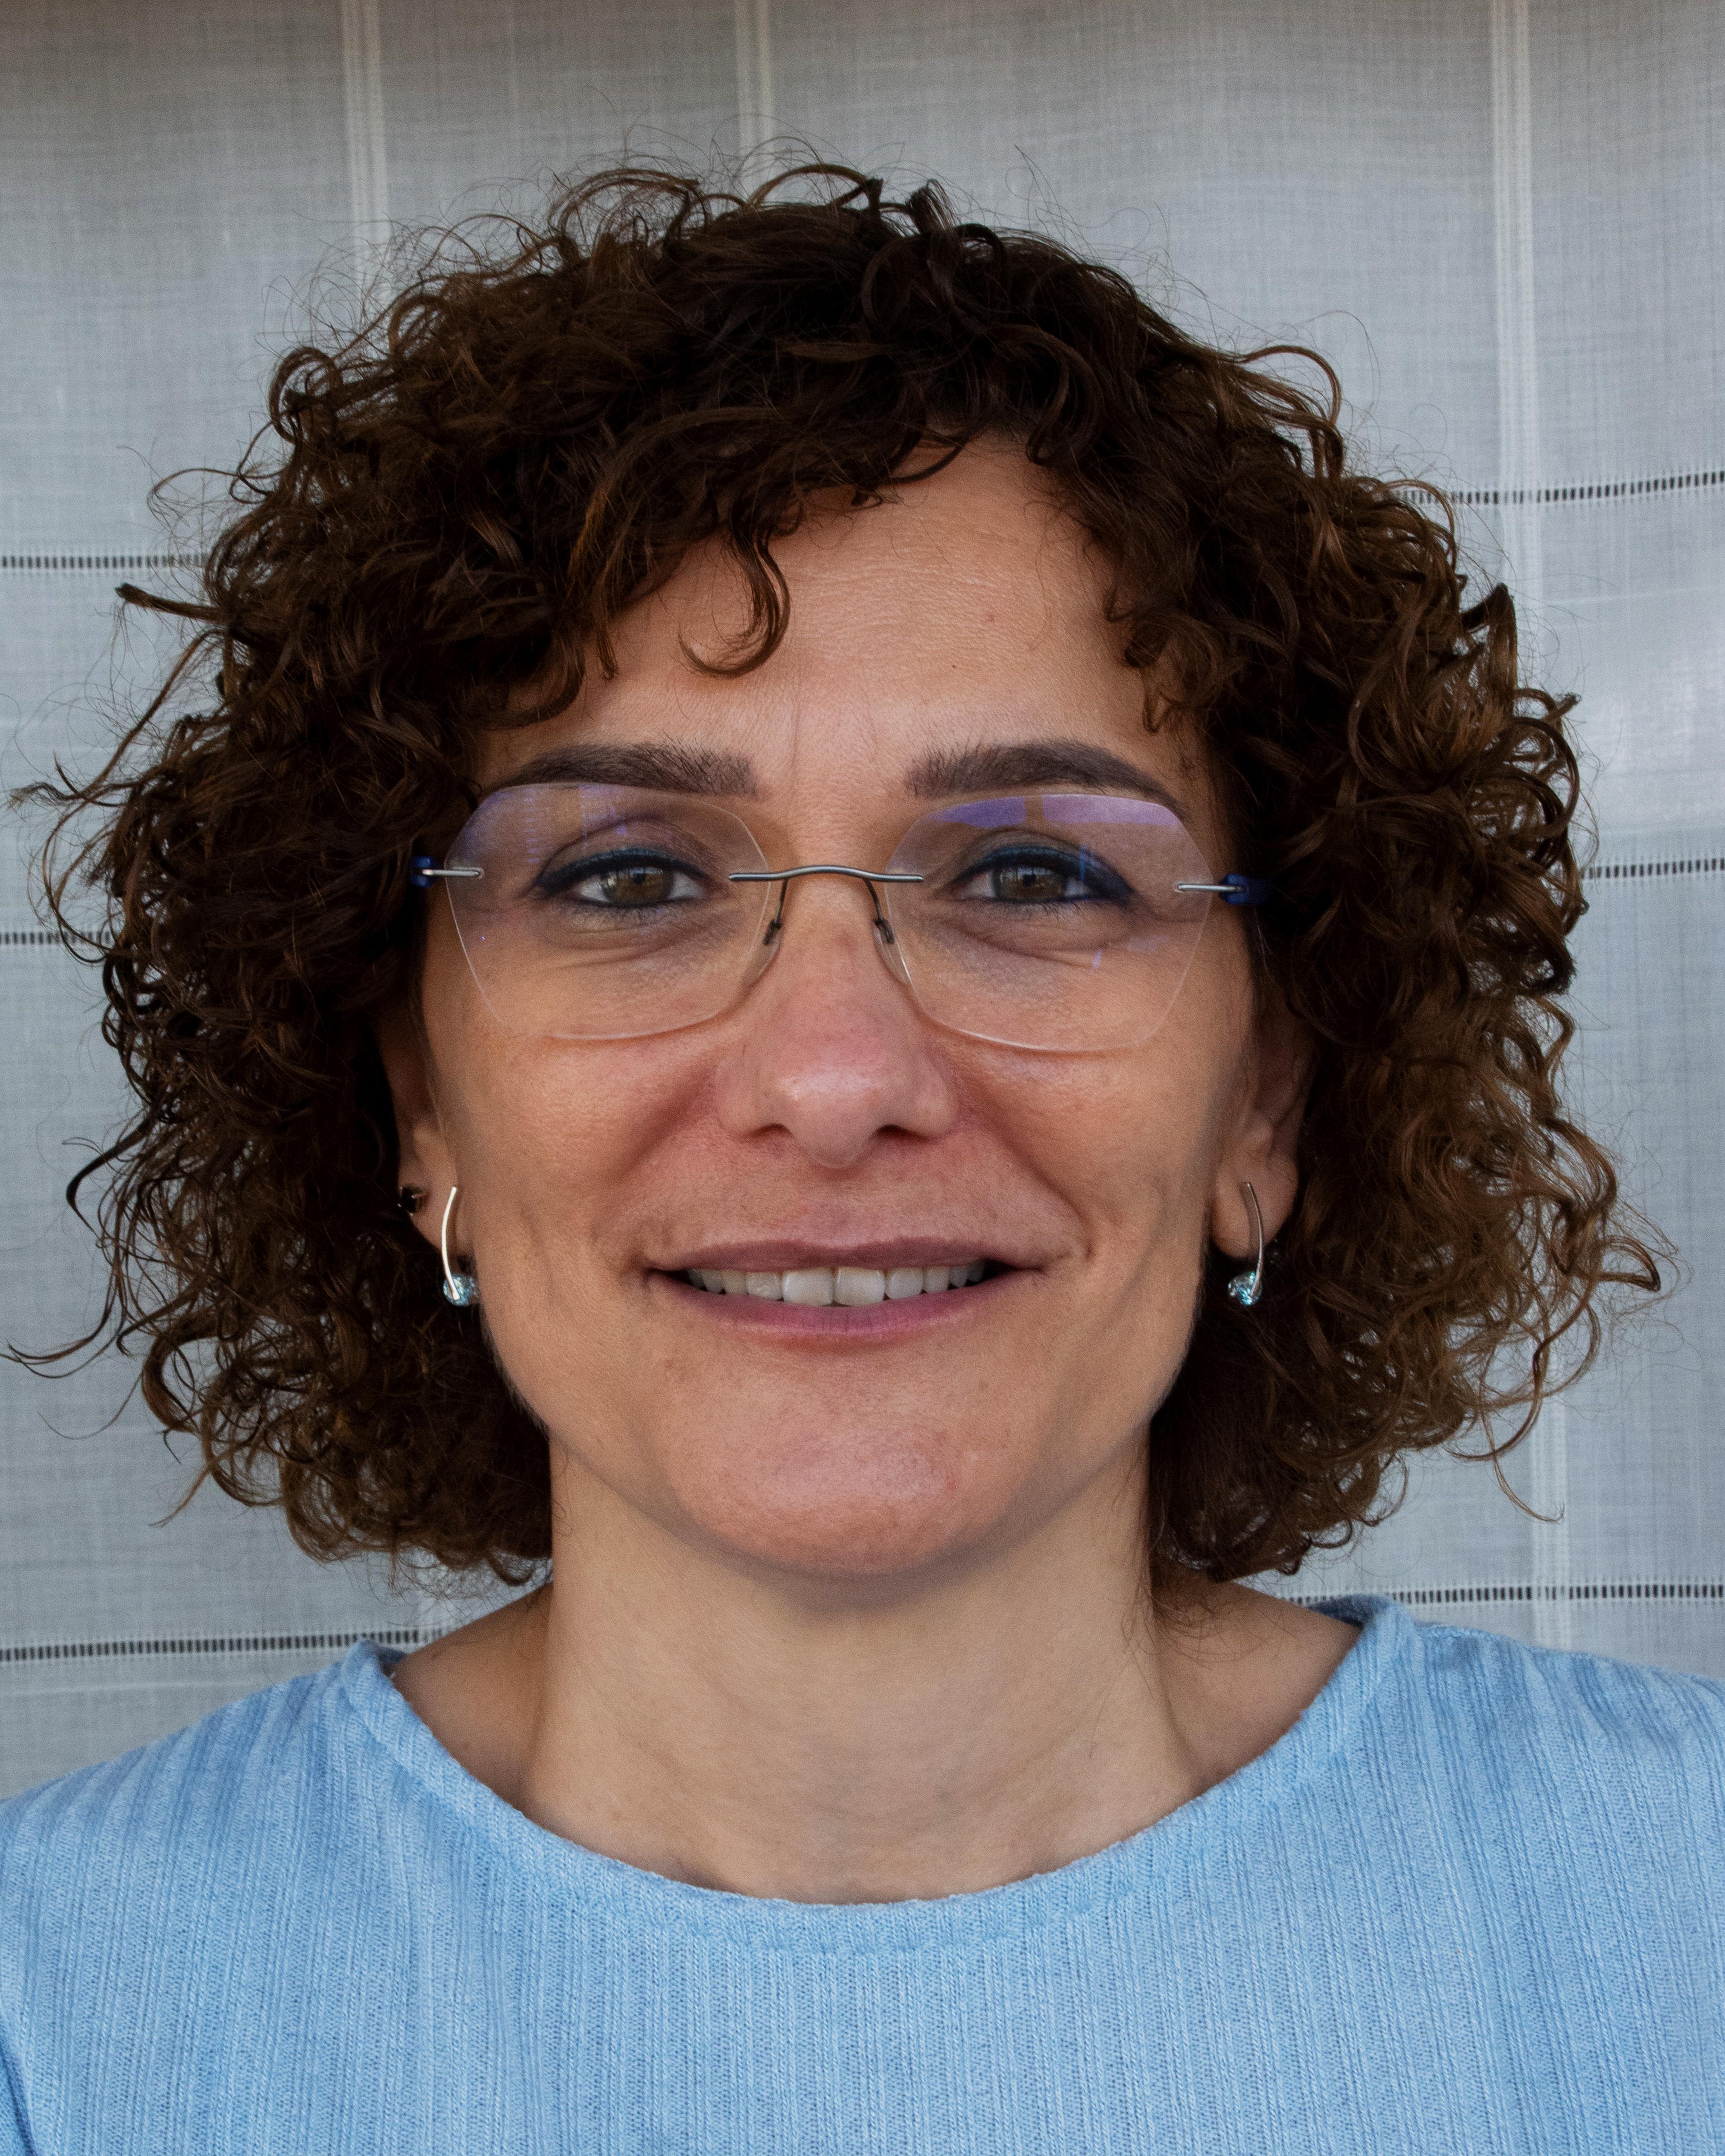 Laura Maria Gonzalez-vila Puchades